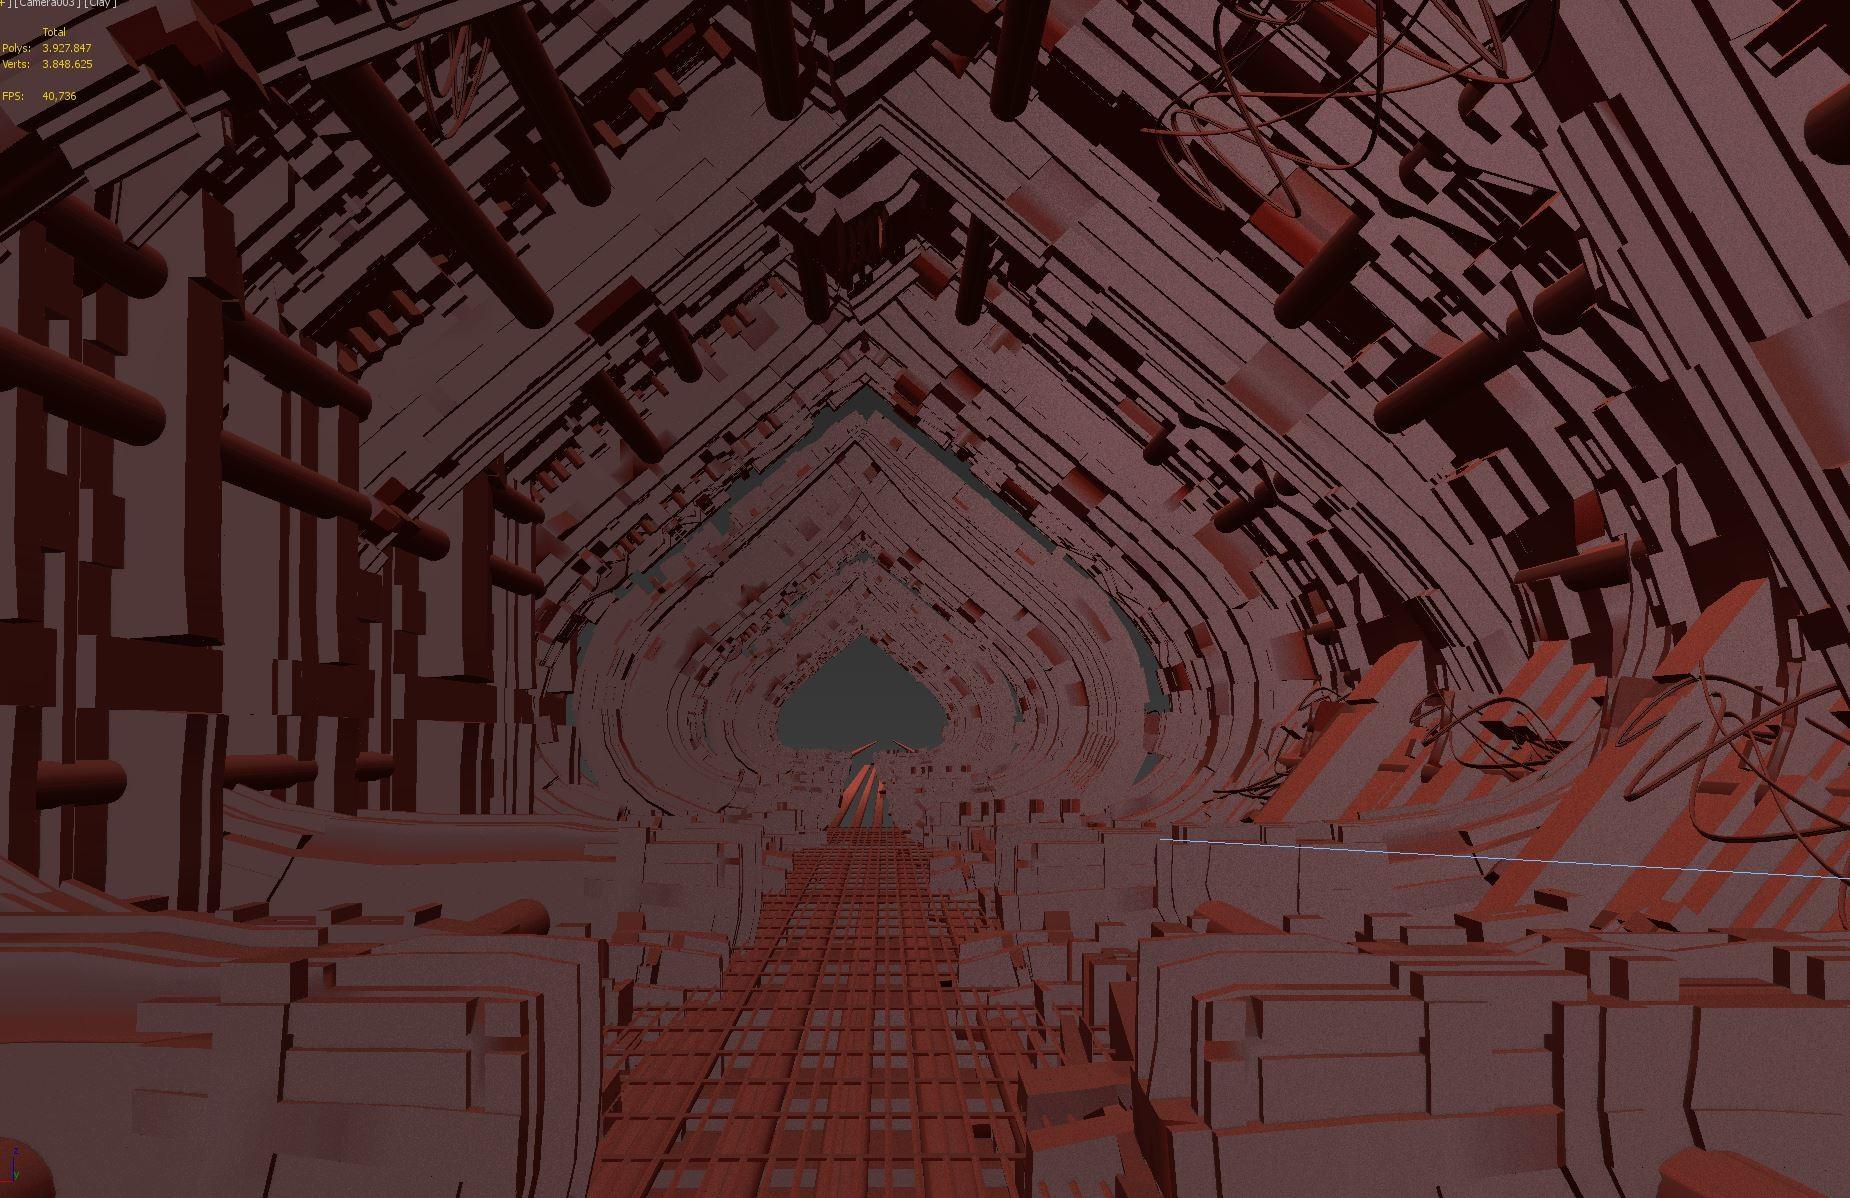 Kresimir jelusic robob3ar 233 020616 b tunnel2 proc